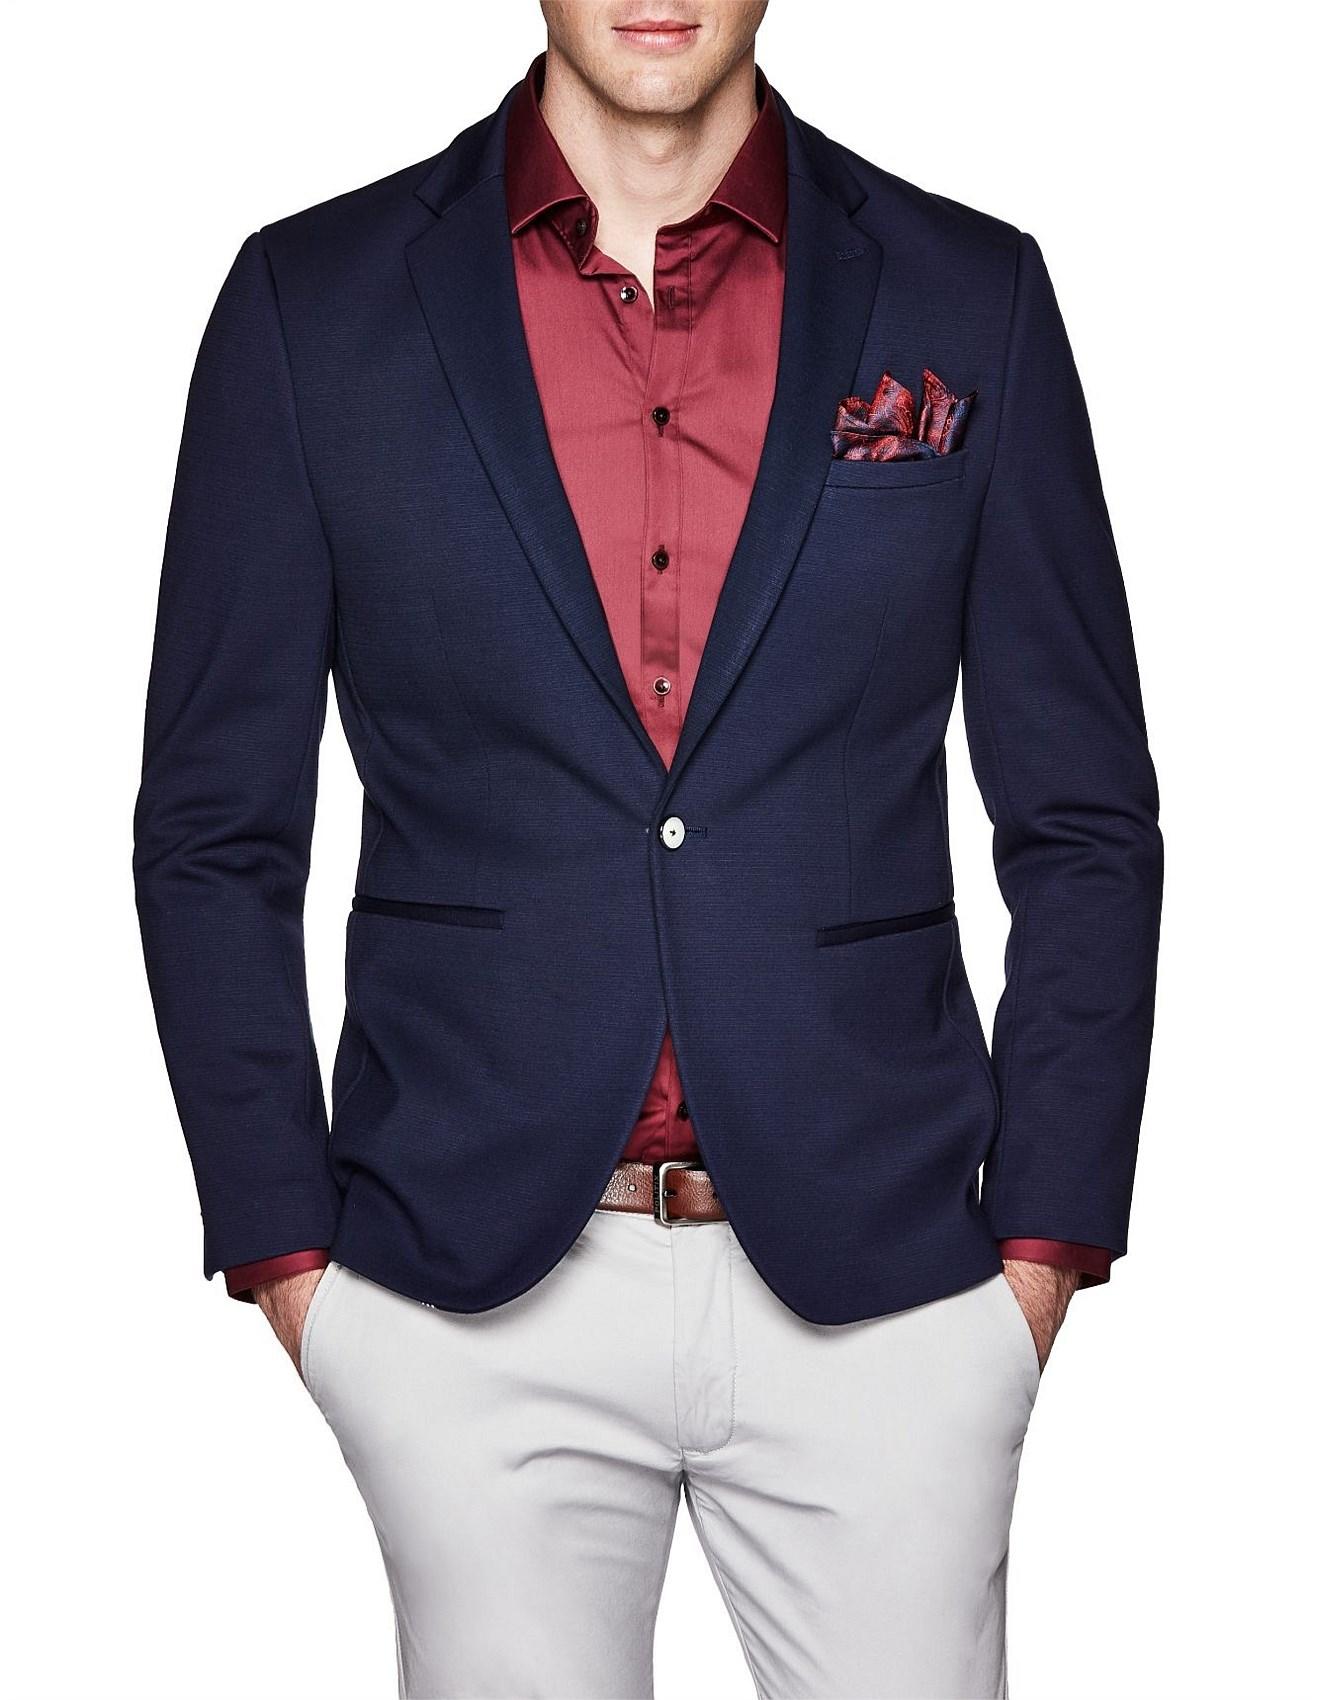 6658f3ad Men's Jackets & Coats | Leather Jackets Online | David Jones ...